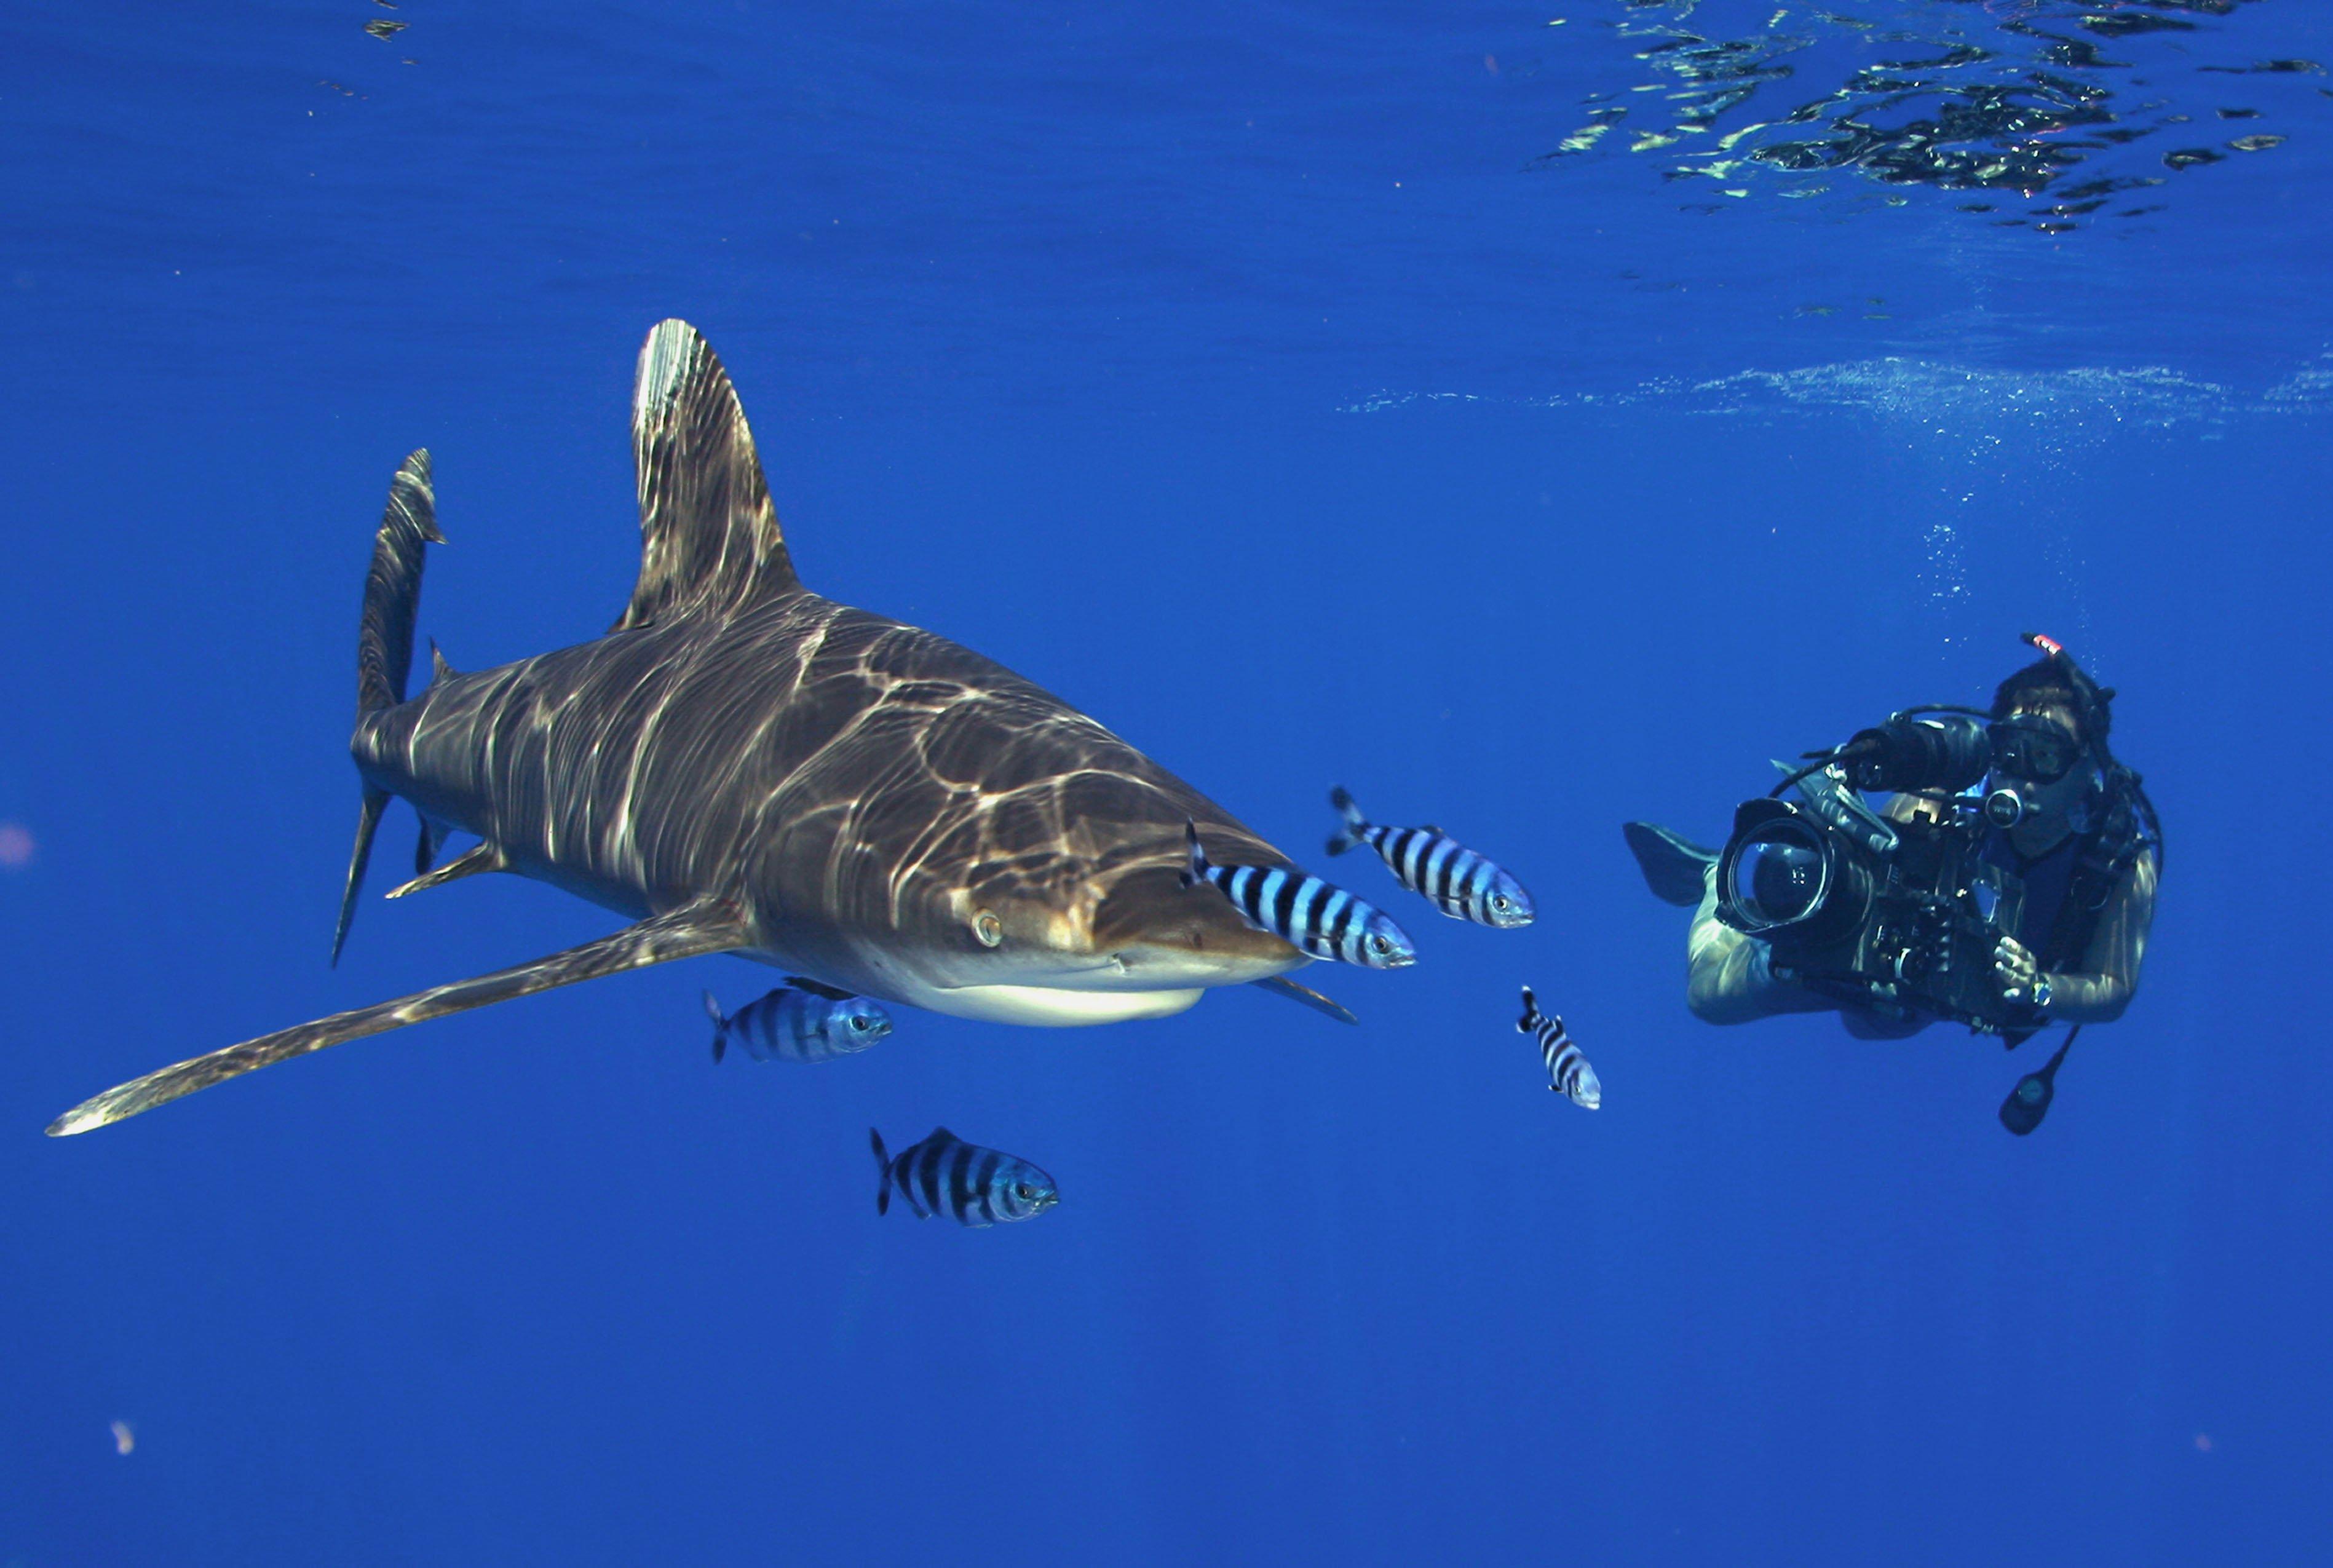 scuba diving wallpaper wallpapers - photo #34